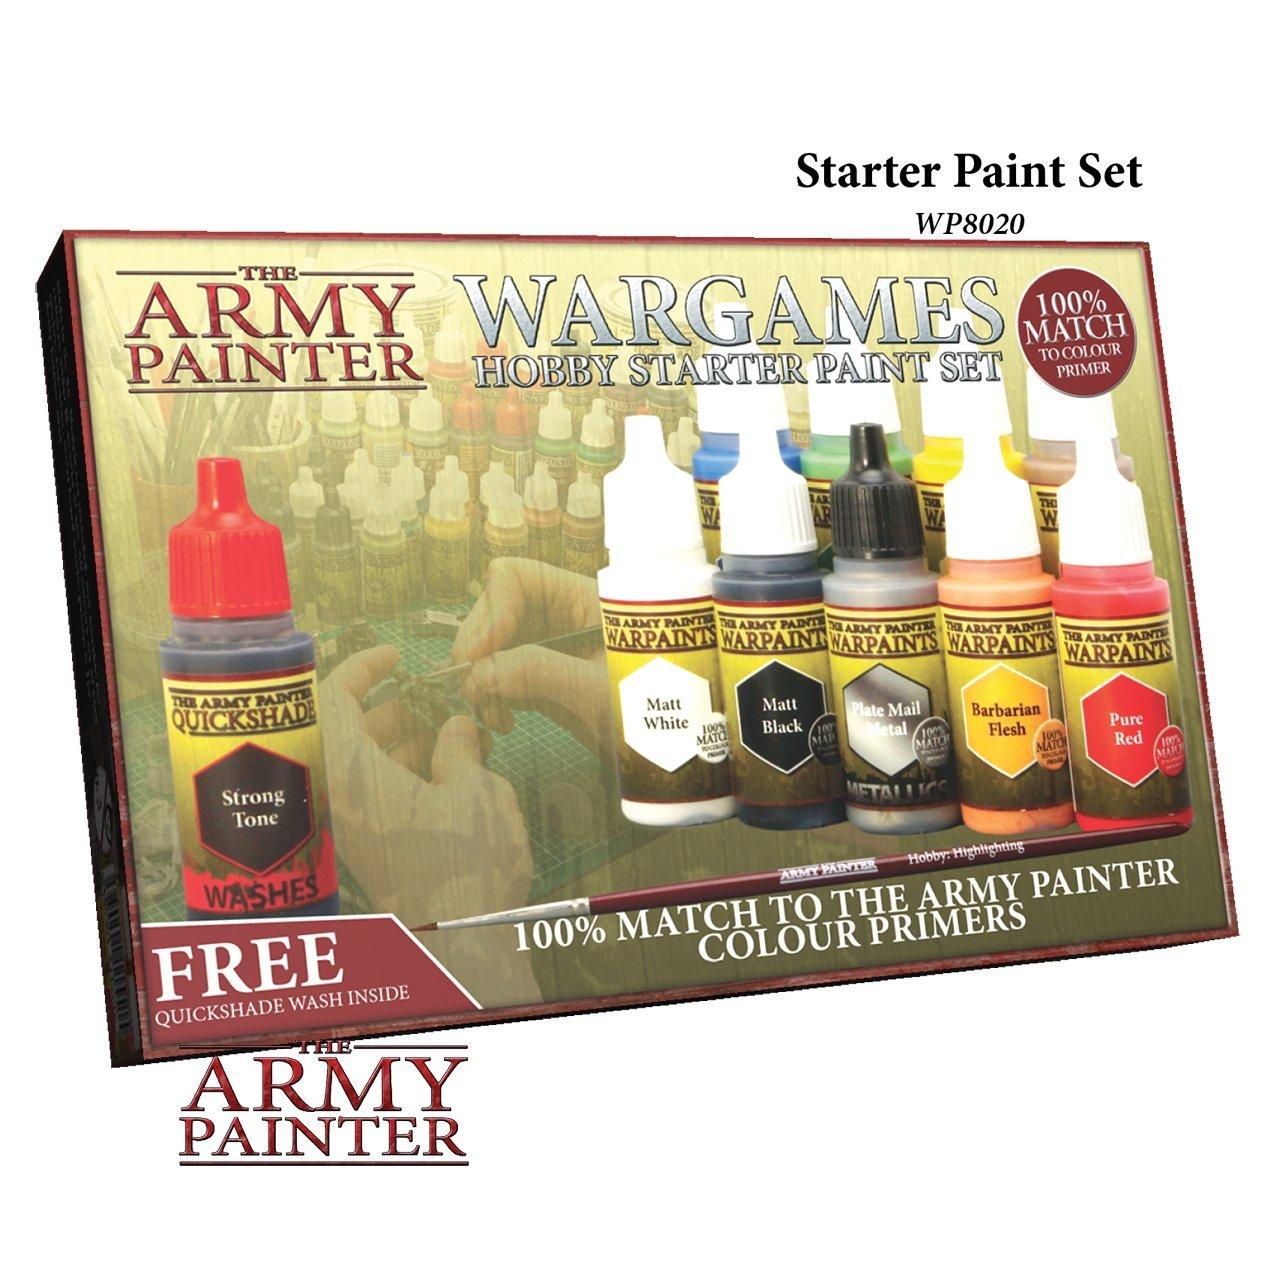 The Army Painter Wargames ホビースターターペイントセット ミニチュアペイントセット 10本 模型用ペイント ハイライトブラシ付き 18ml/ボトル ミニチュア用ペイントキット 非毒性アクリルペイントセット   B01MTXRU2L